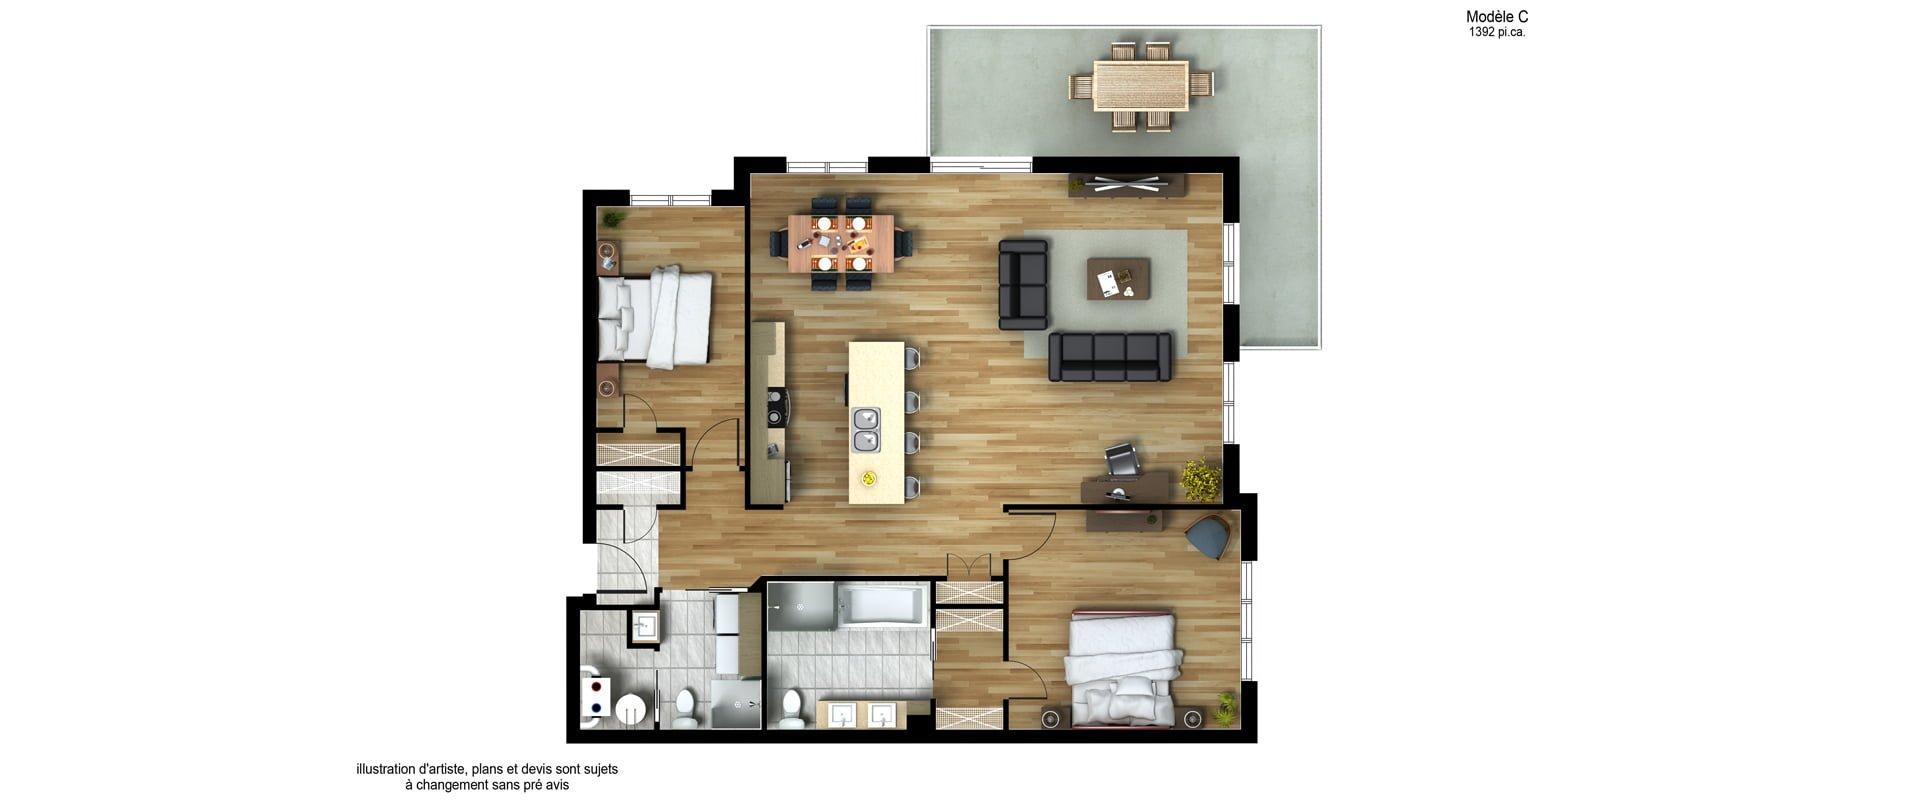 Les Habitations Innovatel condos neufs X15 Mirabel modèle C